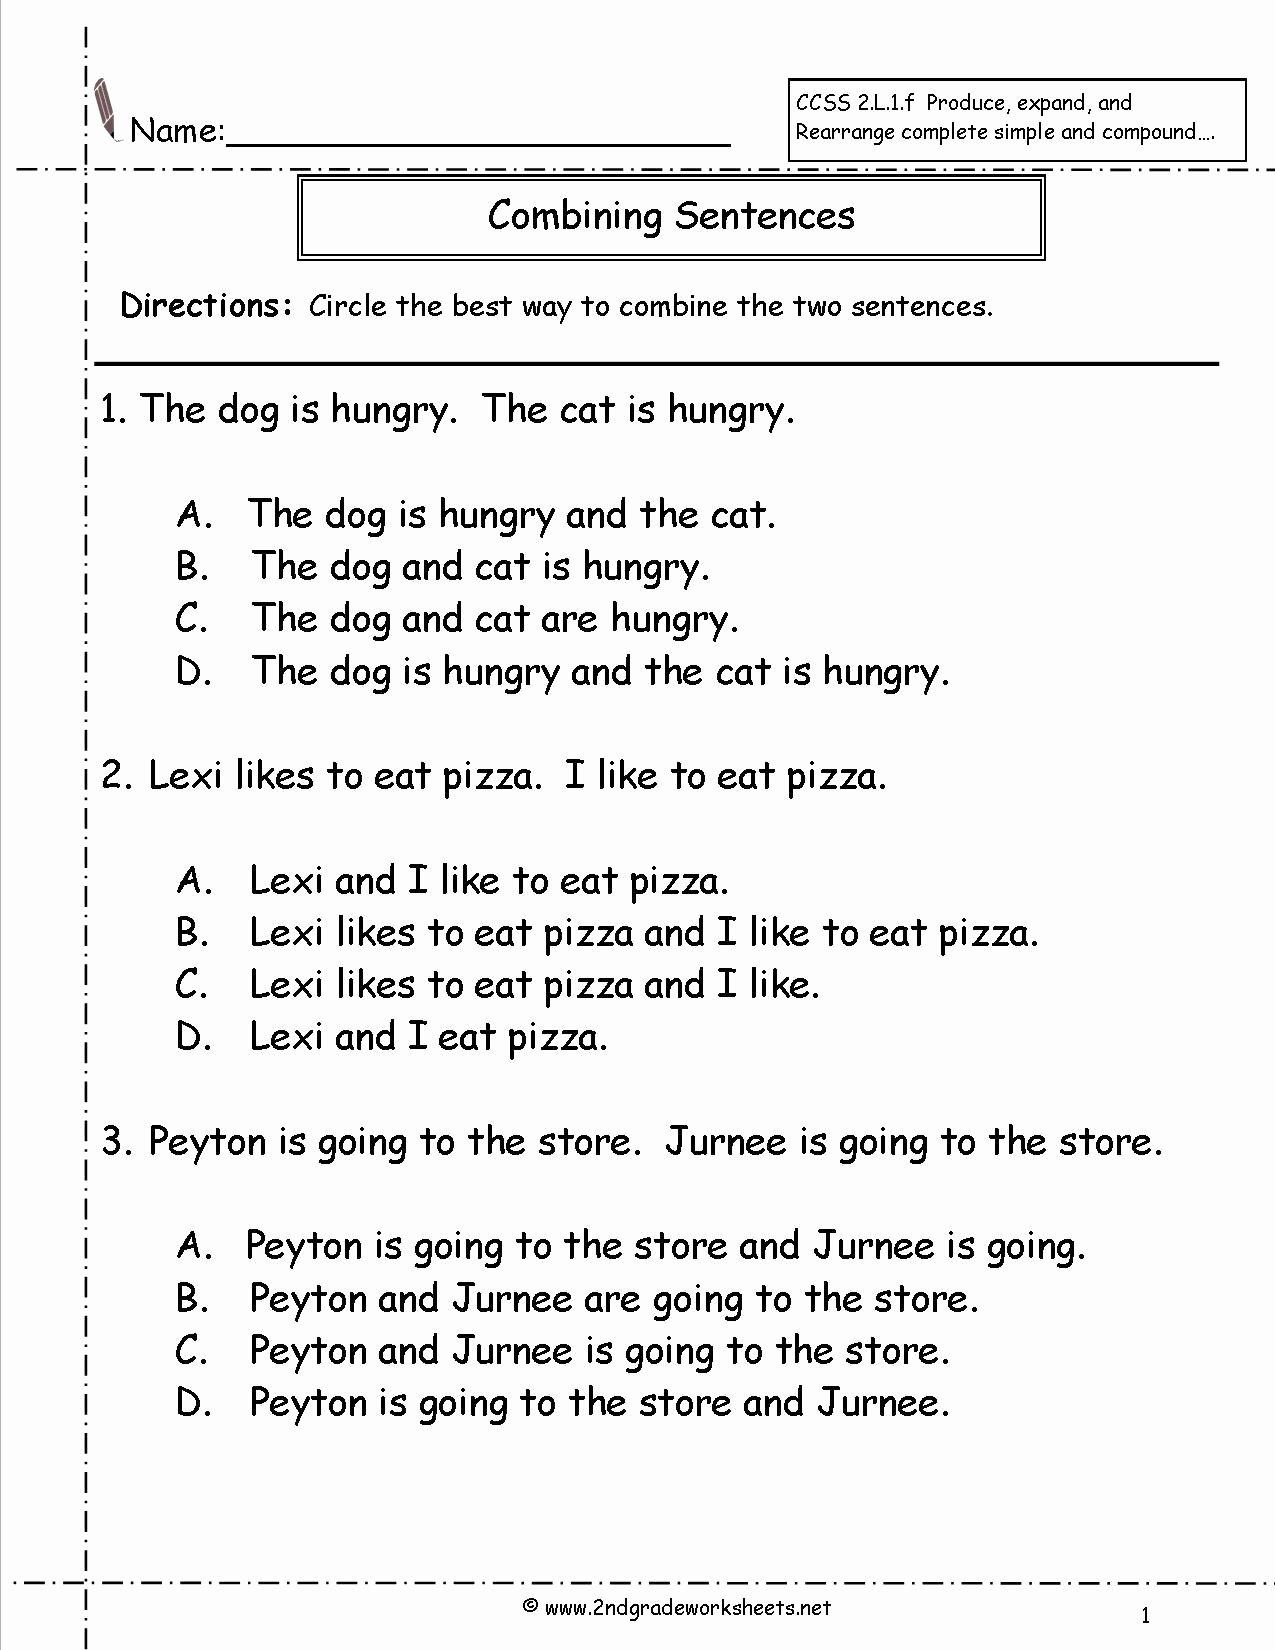 Compound Sentences Worksheet with Answers Fresh Bining Sentences Worksheet